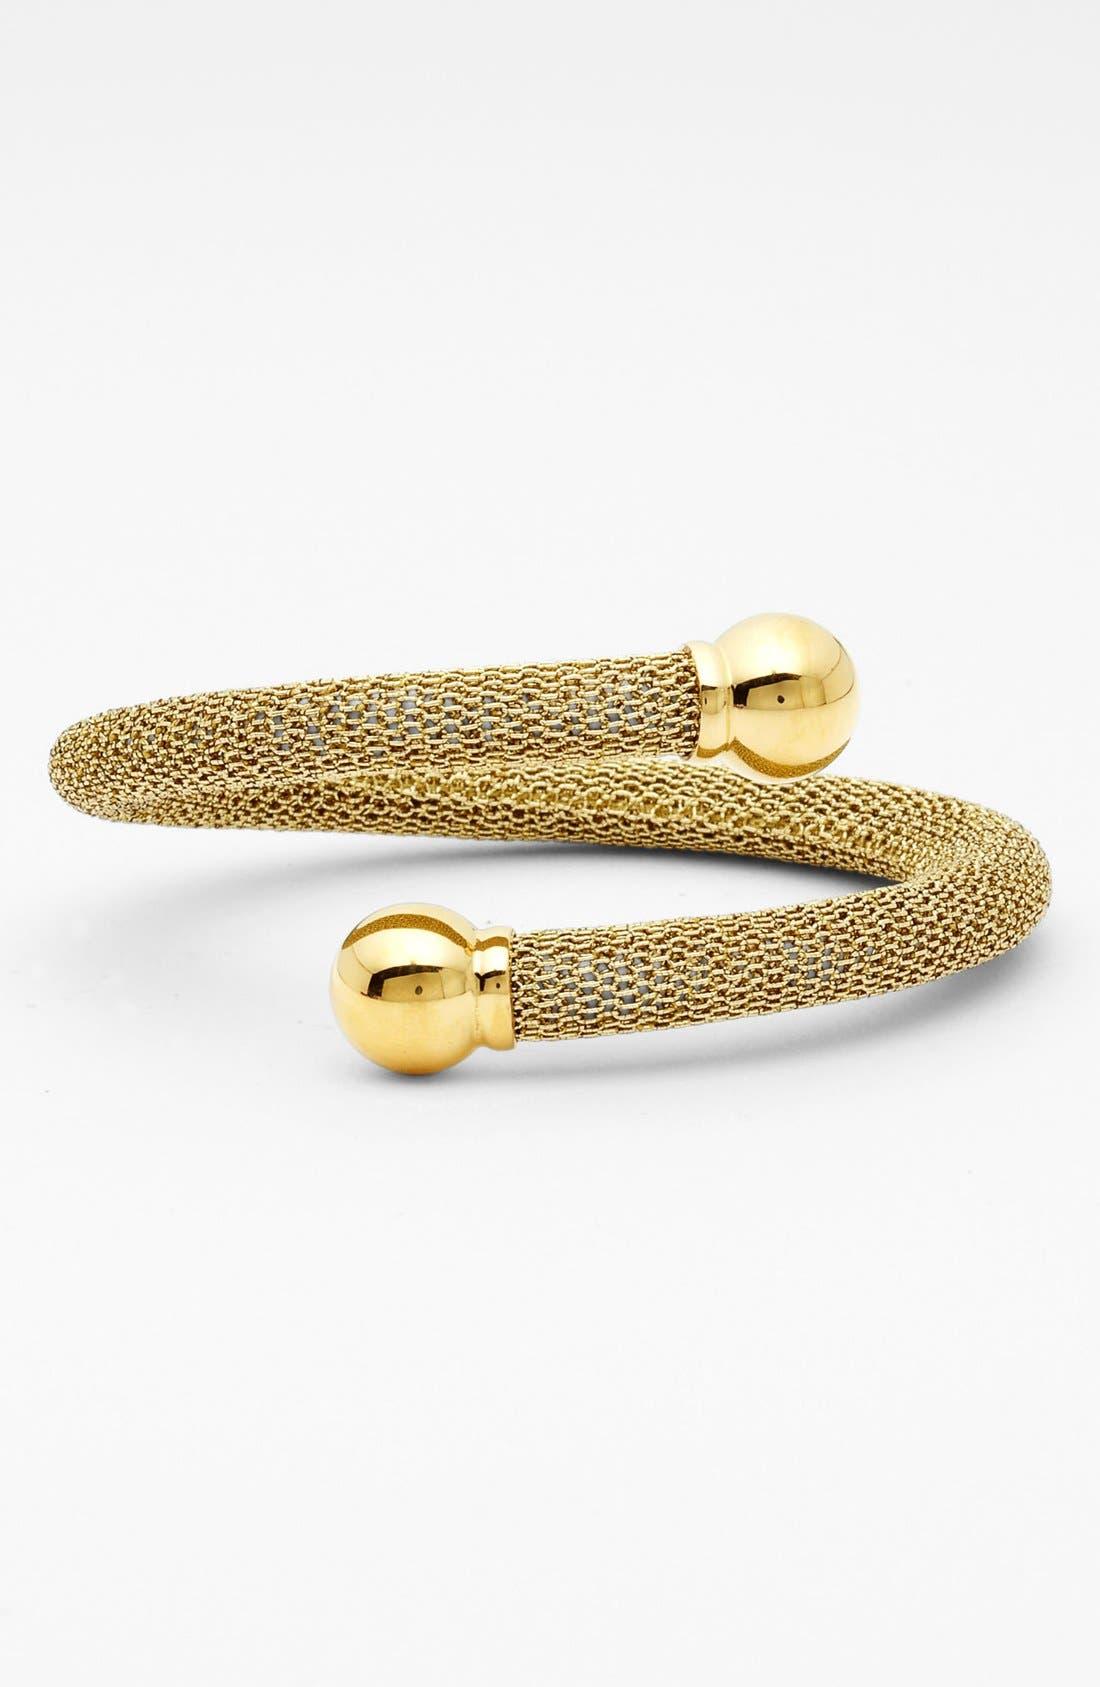 Alternate Image 1 Selected - Adami & Martucci 'Mesh' Coil Bracelet (Nordstrom Exclusive)